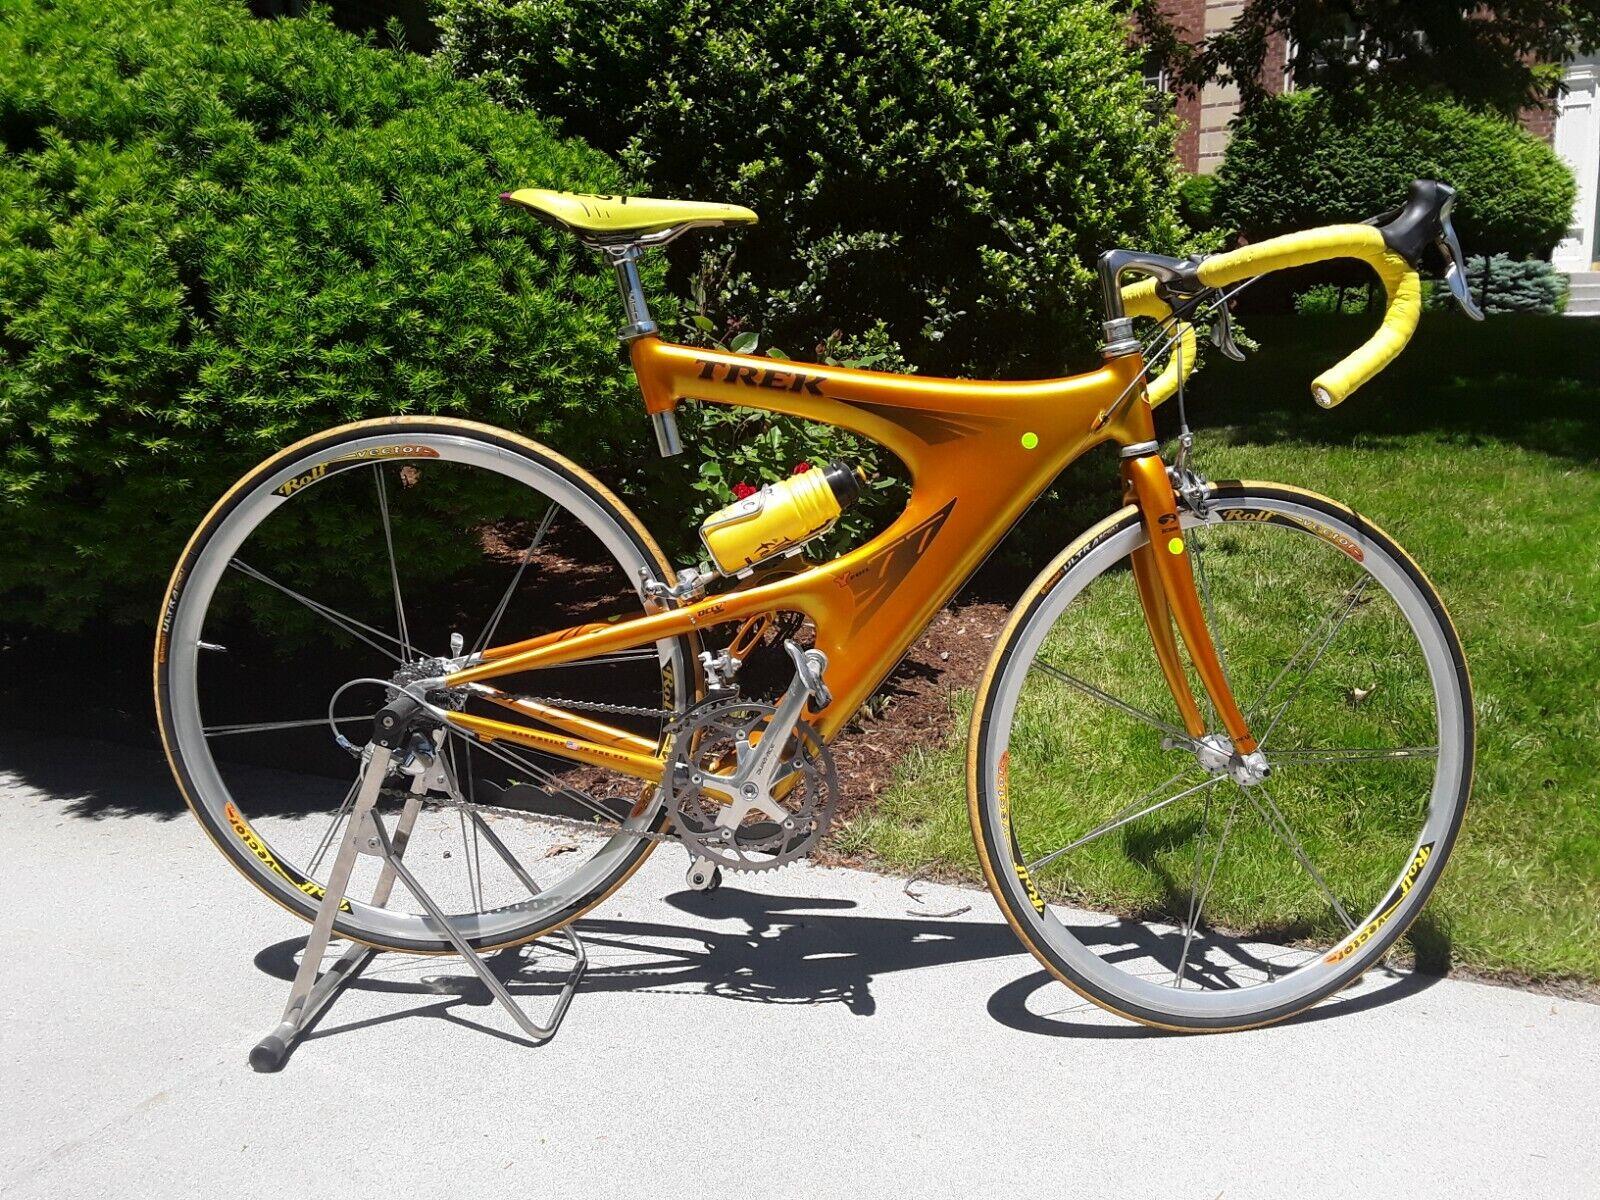 a2b8c1d6489 Find Trek Mountain Bikes for sale